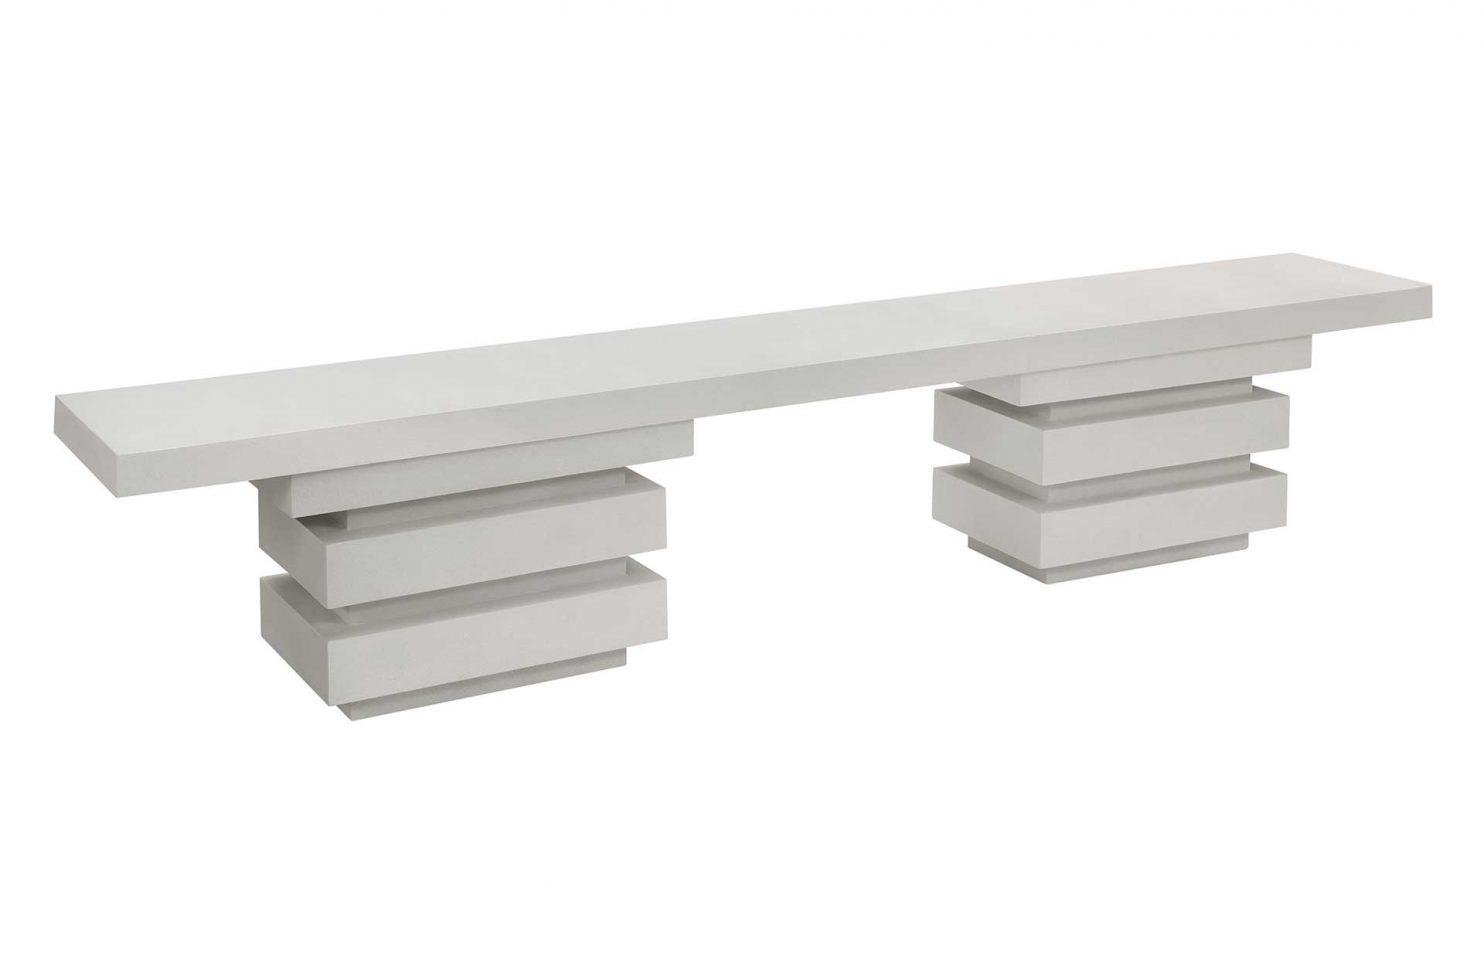 prov frp meditation rectangle bench S1568100215 3Q above web